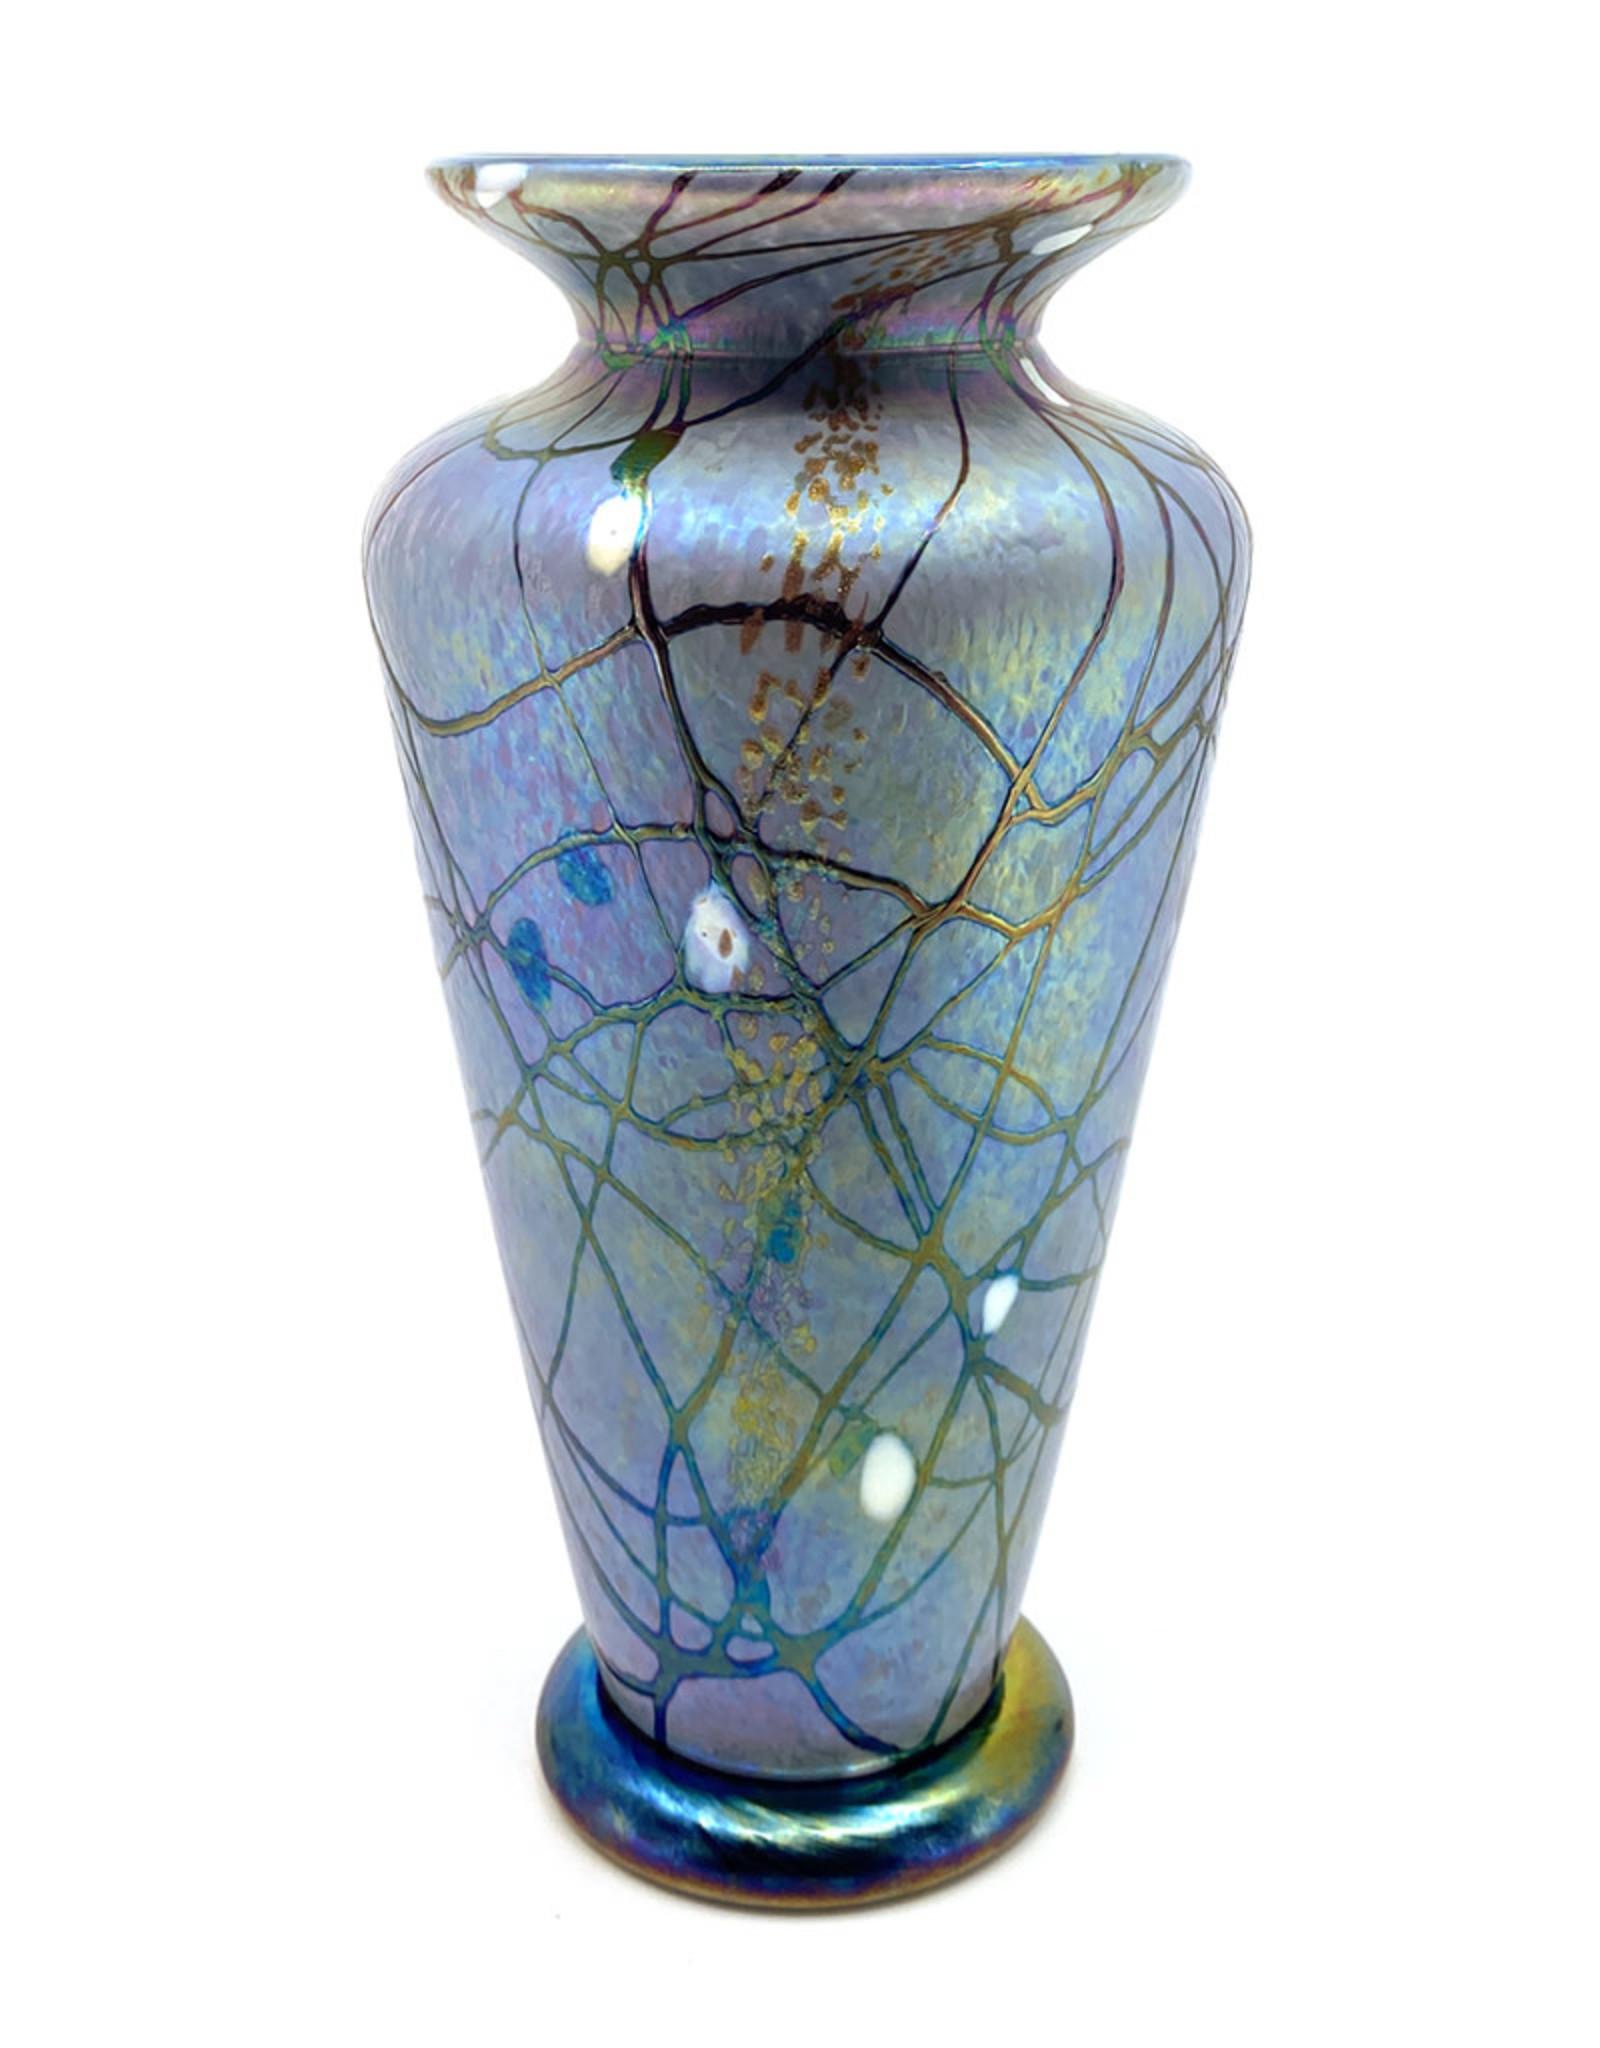 VINES ART GLASS MEDIUM TRADITIONAL PARISIAN FOG VASE